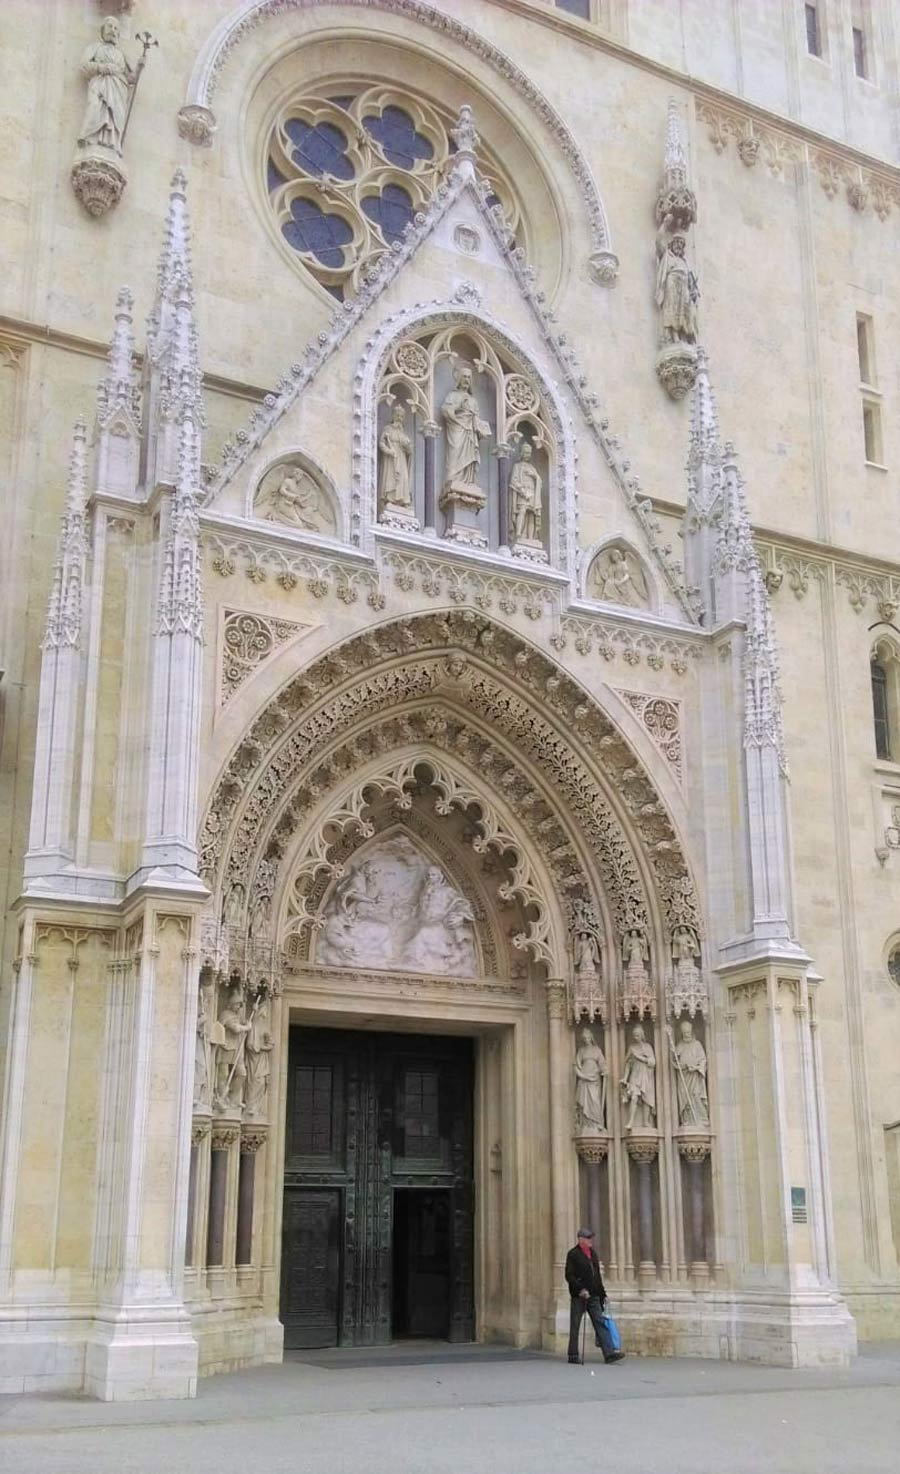 Posjet Zagrebackoj Katedrali